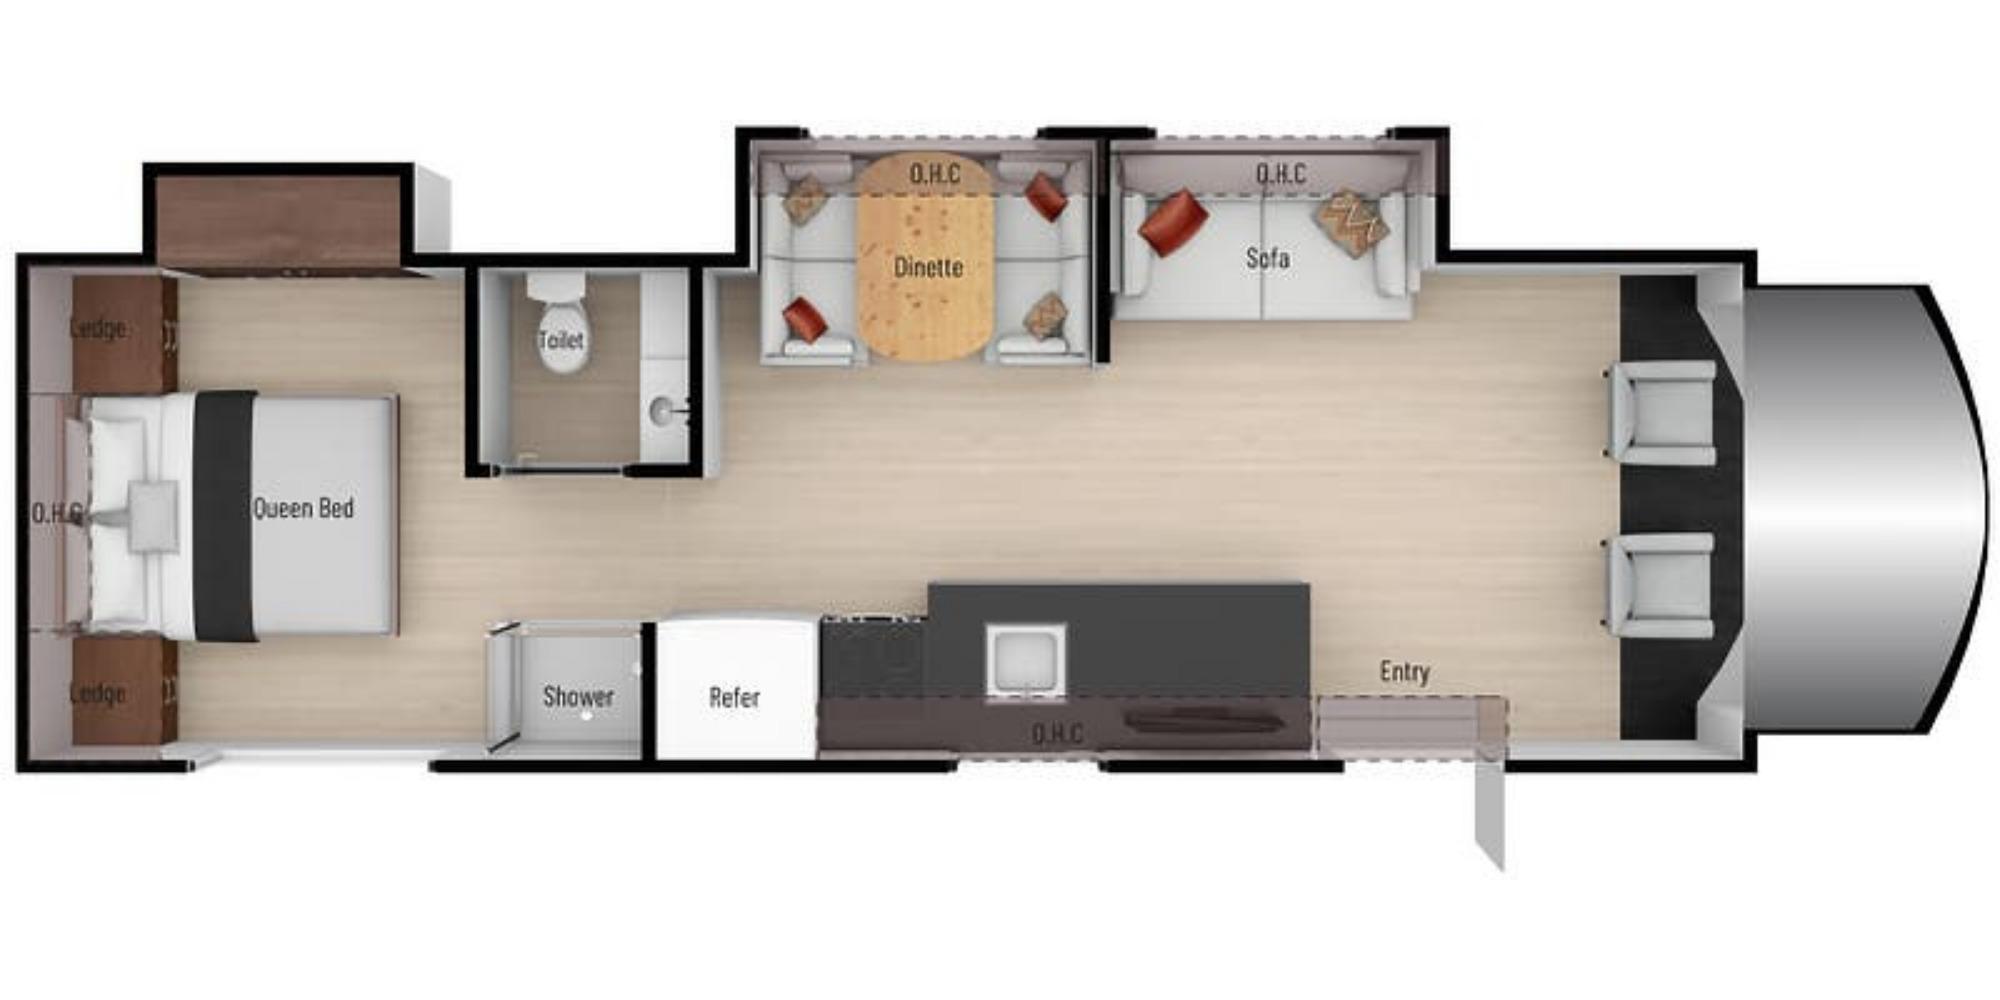 View Floor Plan for 2021 NEXUS RV TRIUMPH 31T